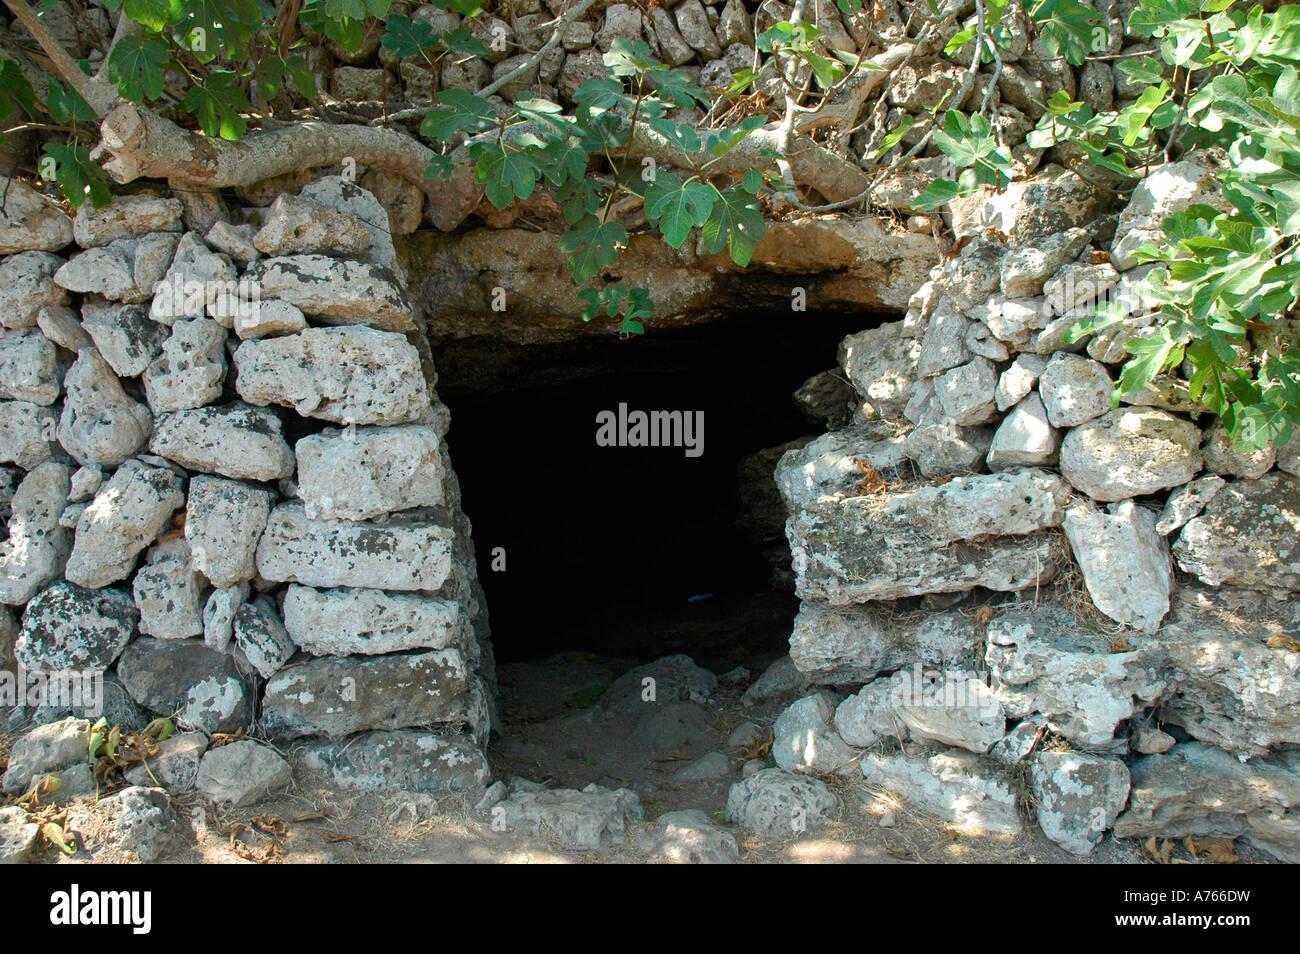 Cave in Talati de Dalt site MENORCA Balearic Islands Spain - Stock Image